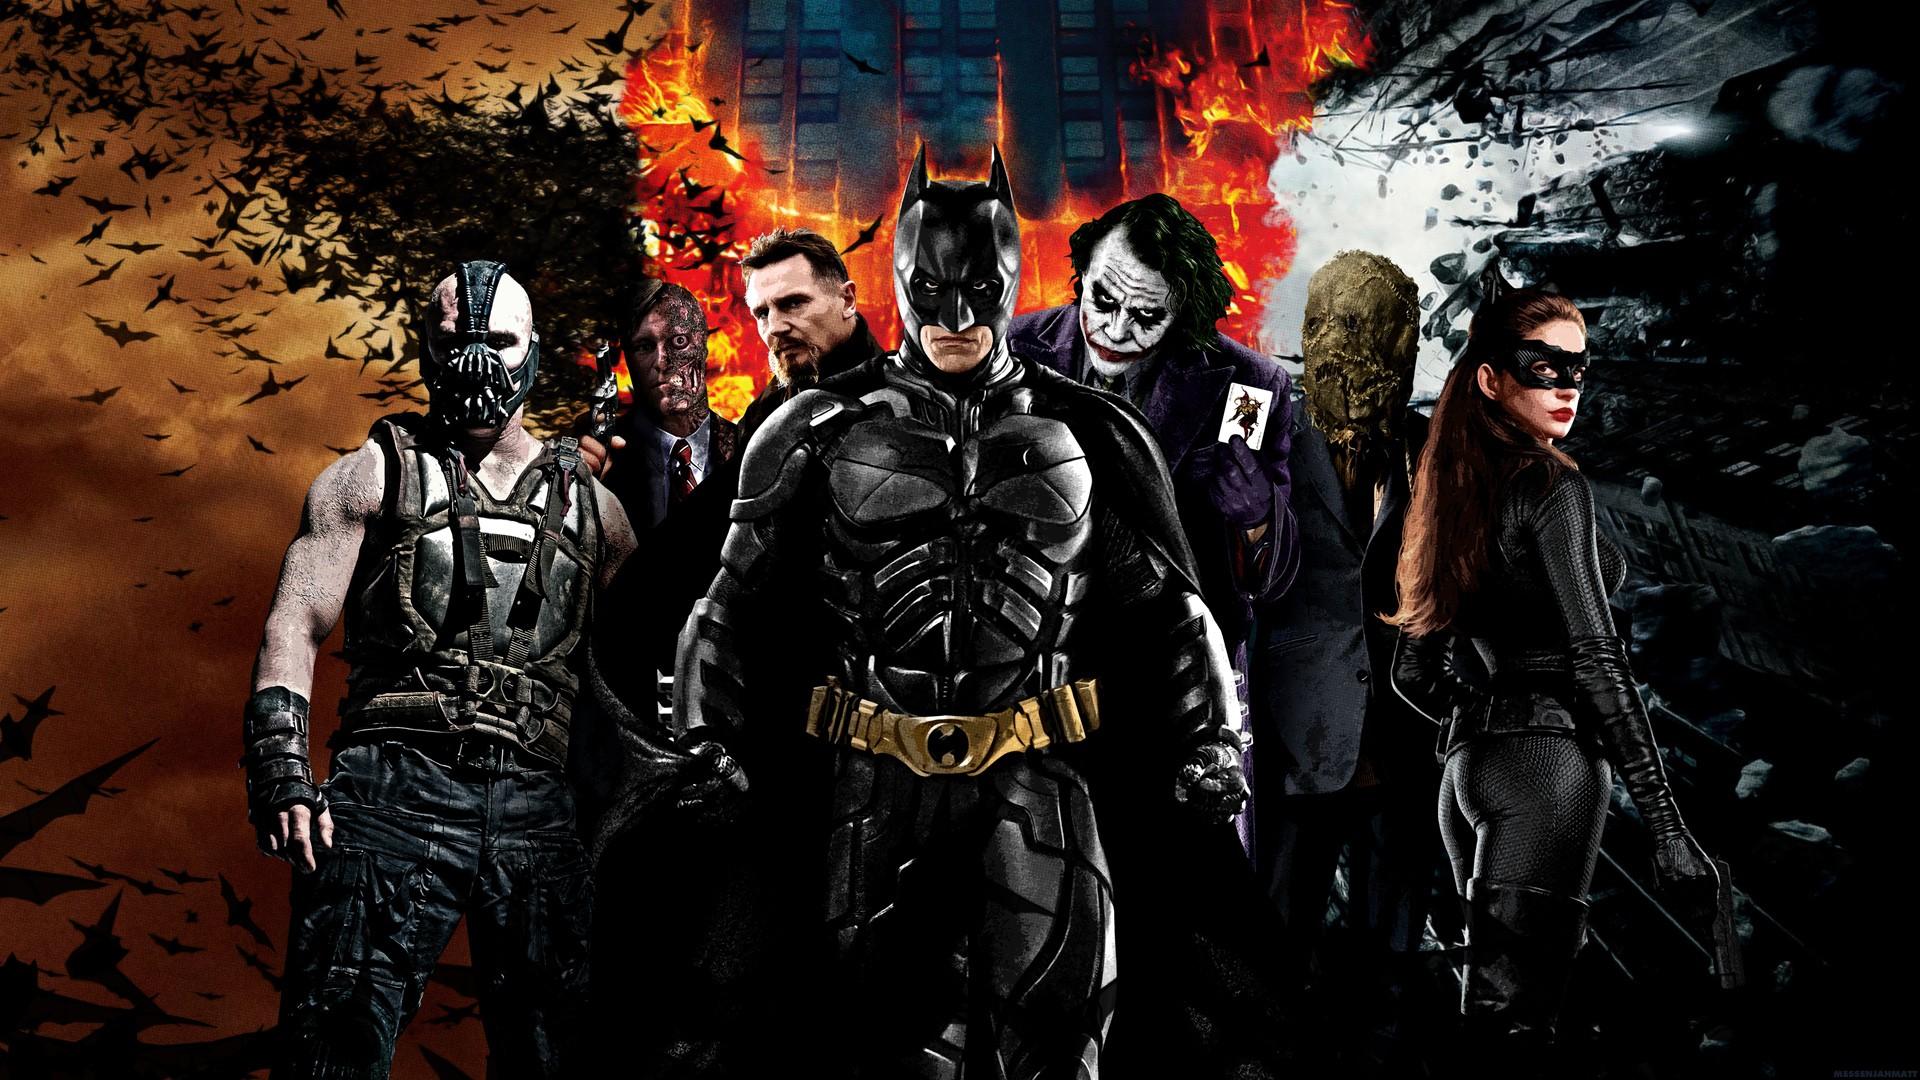 Cool Wallpapers Joker Batman Hd Wallpaper Of Movie Auto 1920x1080